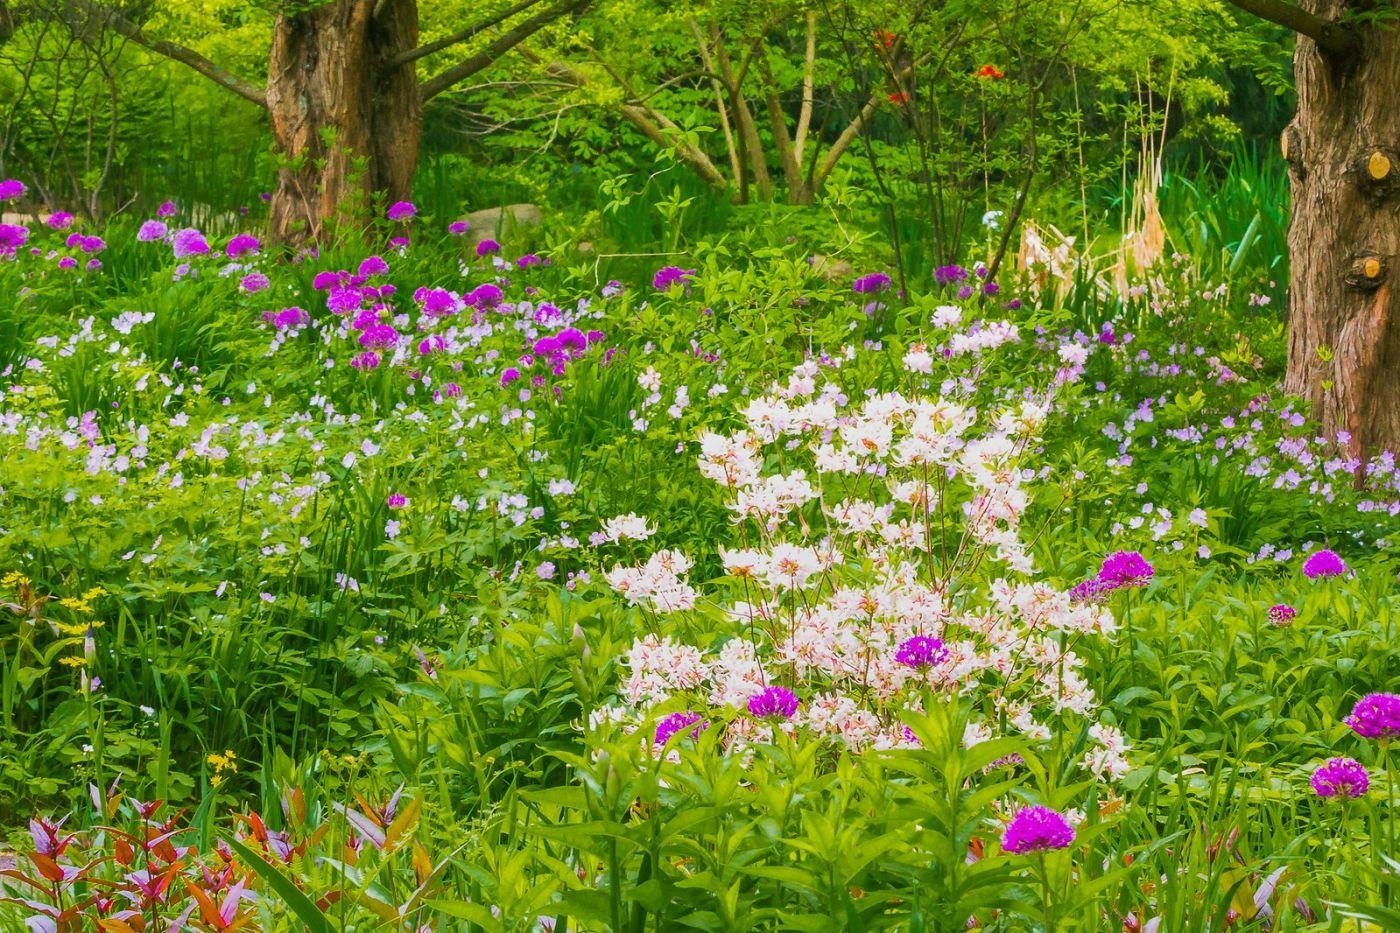 Chanticleer花园,有梦想的季节_图1-22